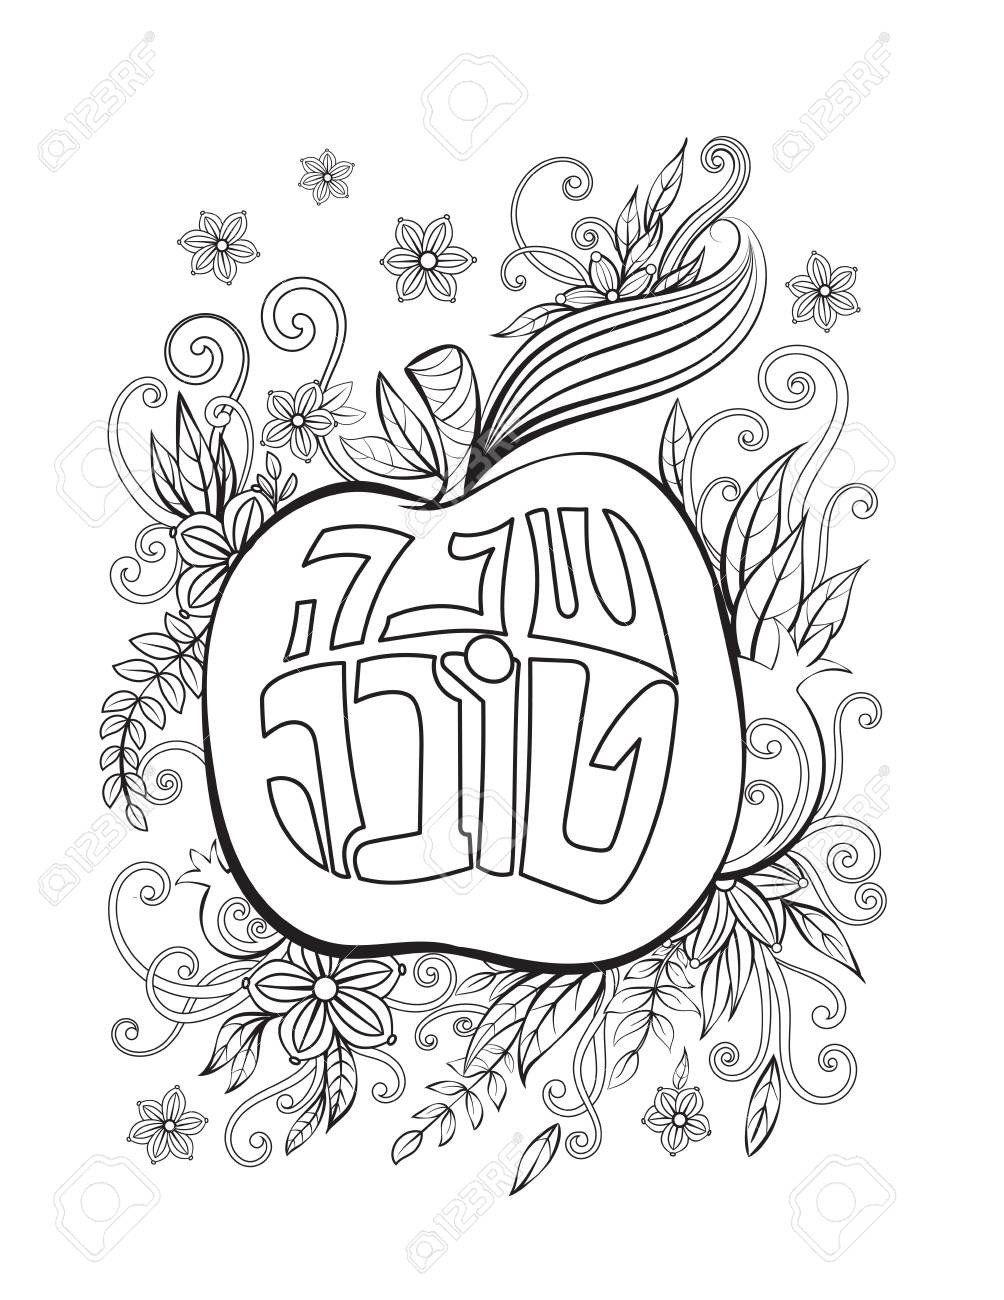 Rosh Hashanah Coloring Pages Rosh Hashanah Coloring Page New Year Coloring Pages Coloring Pages Inspirational Coloring Pages